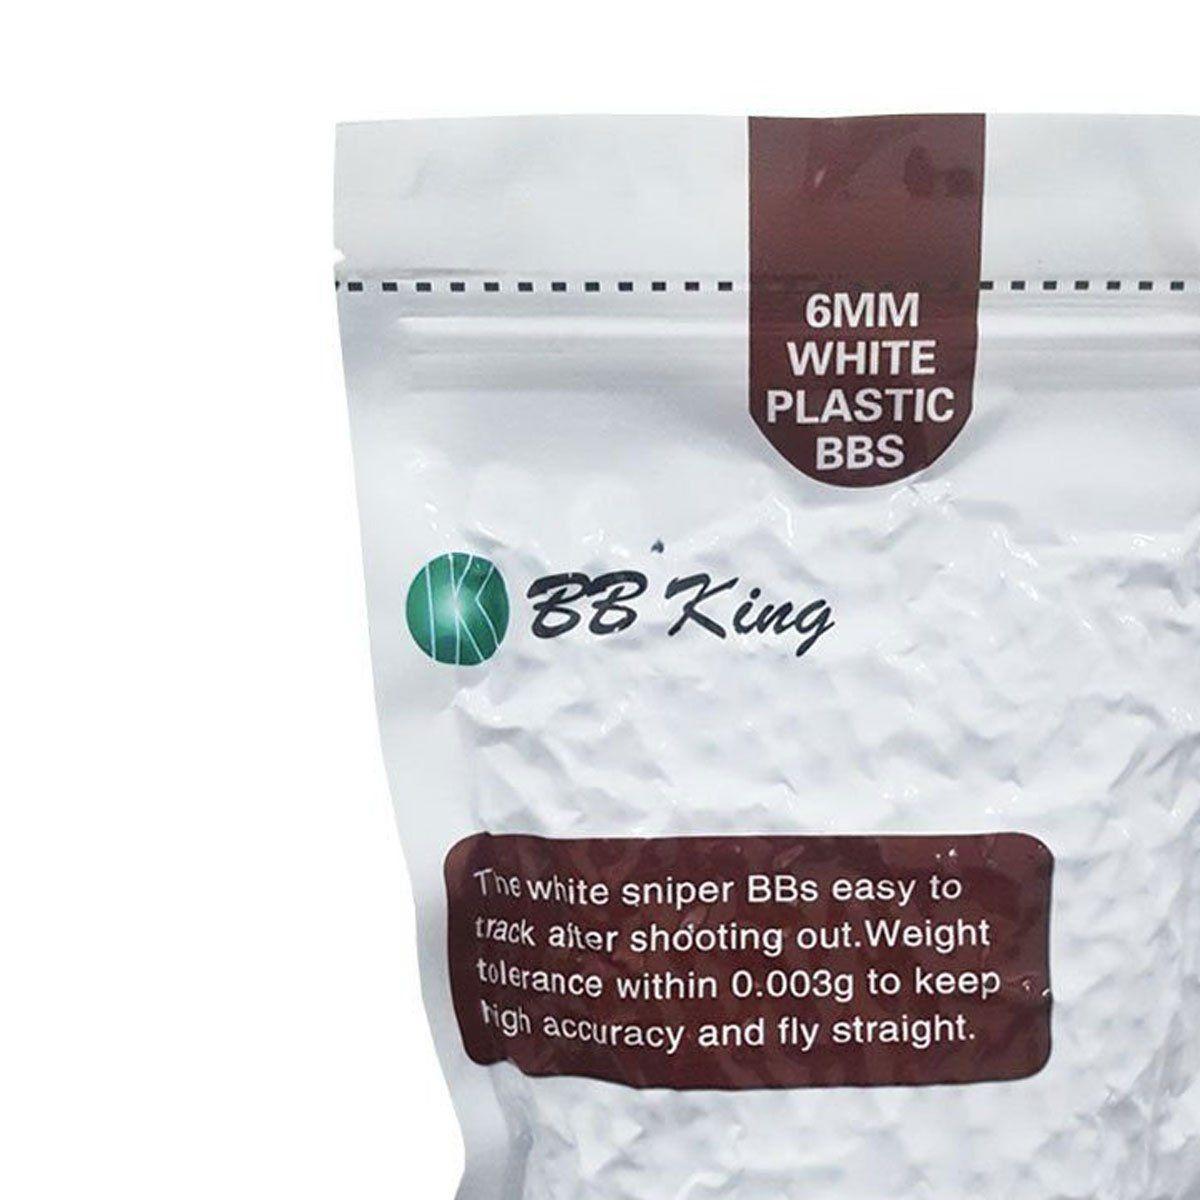 Esferas Plásticas BBs BB King Calibre 6mm 0,36g 1000un